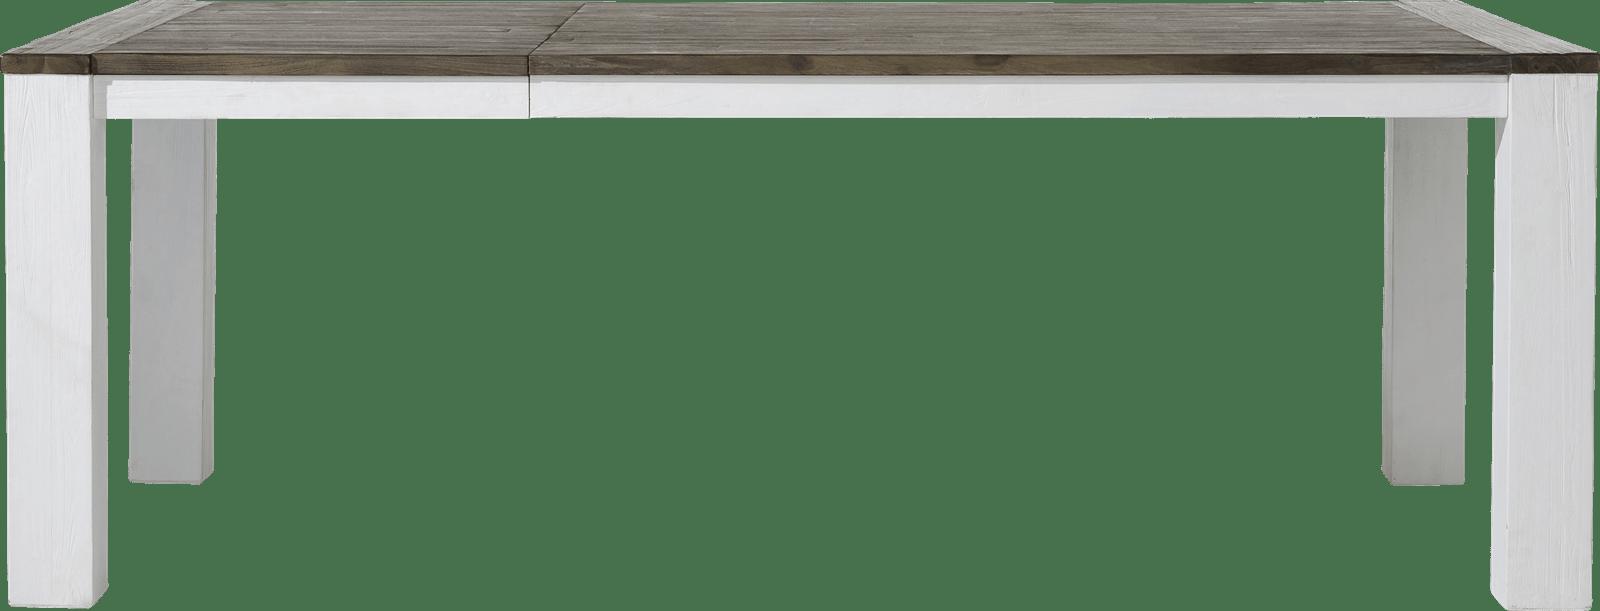 Deaumain - uitschuiftafel 160 (+ 60) x 100 cm